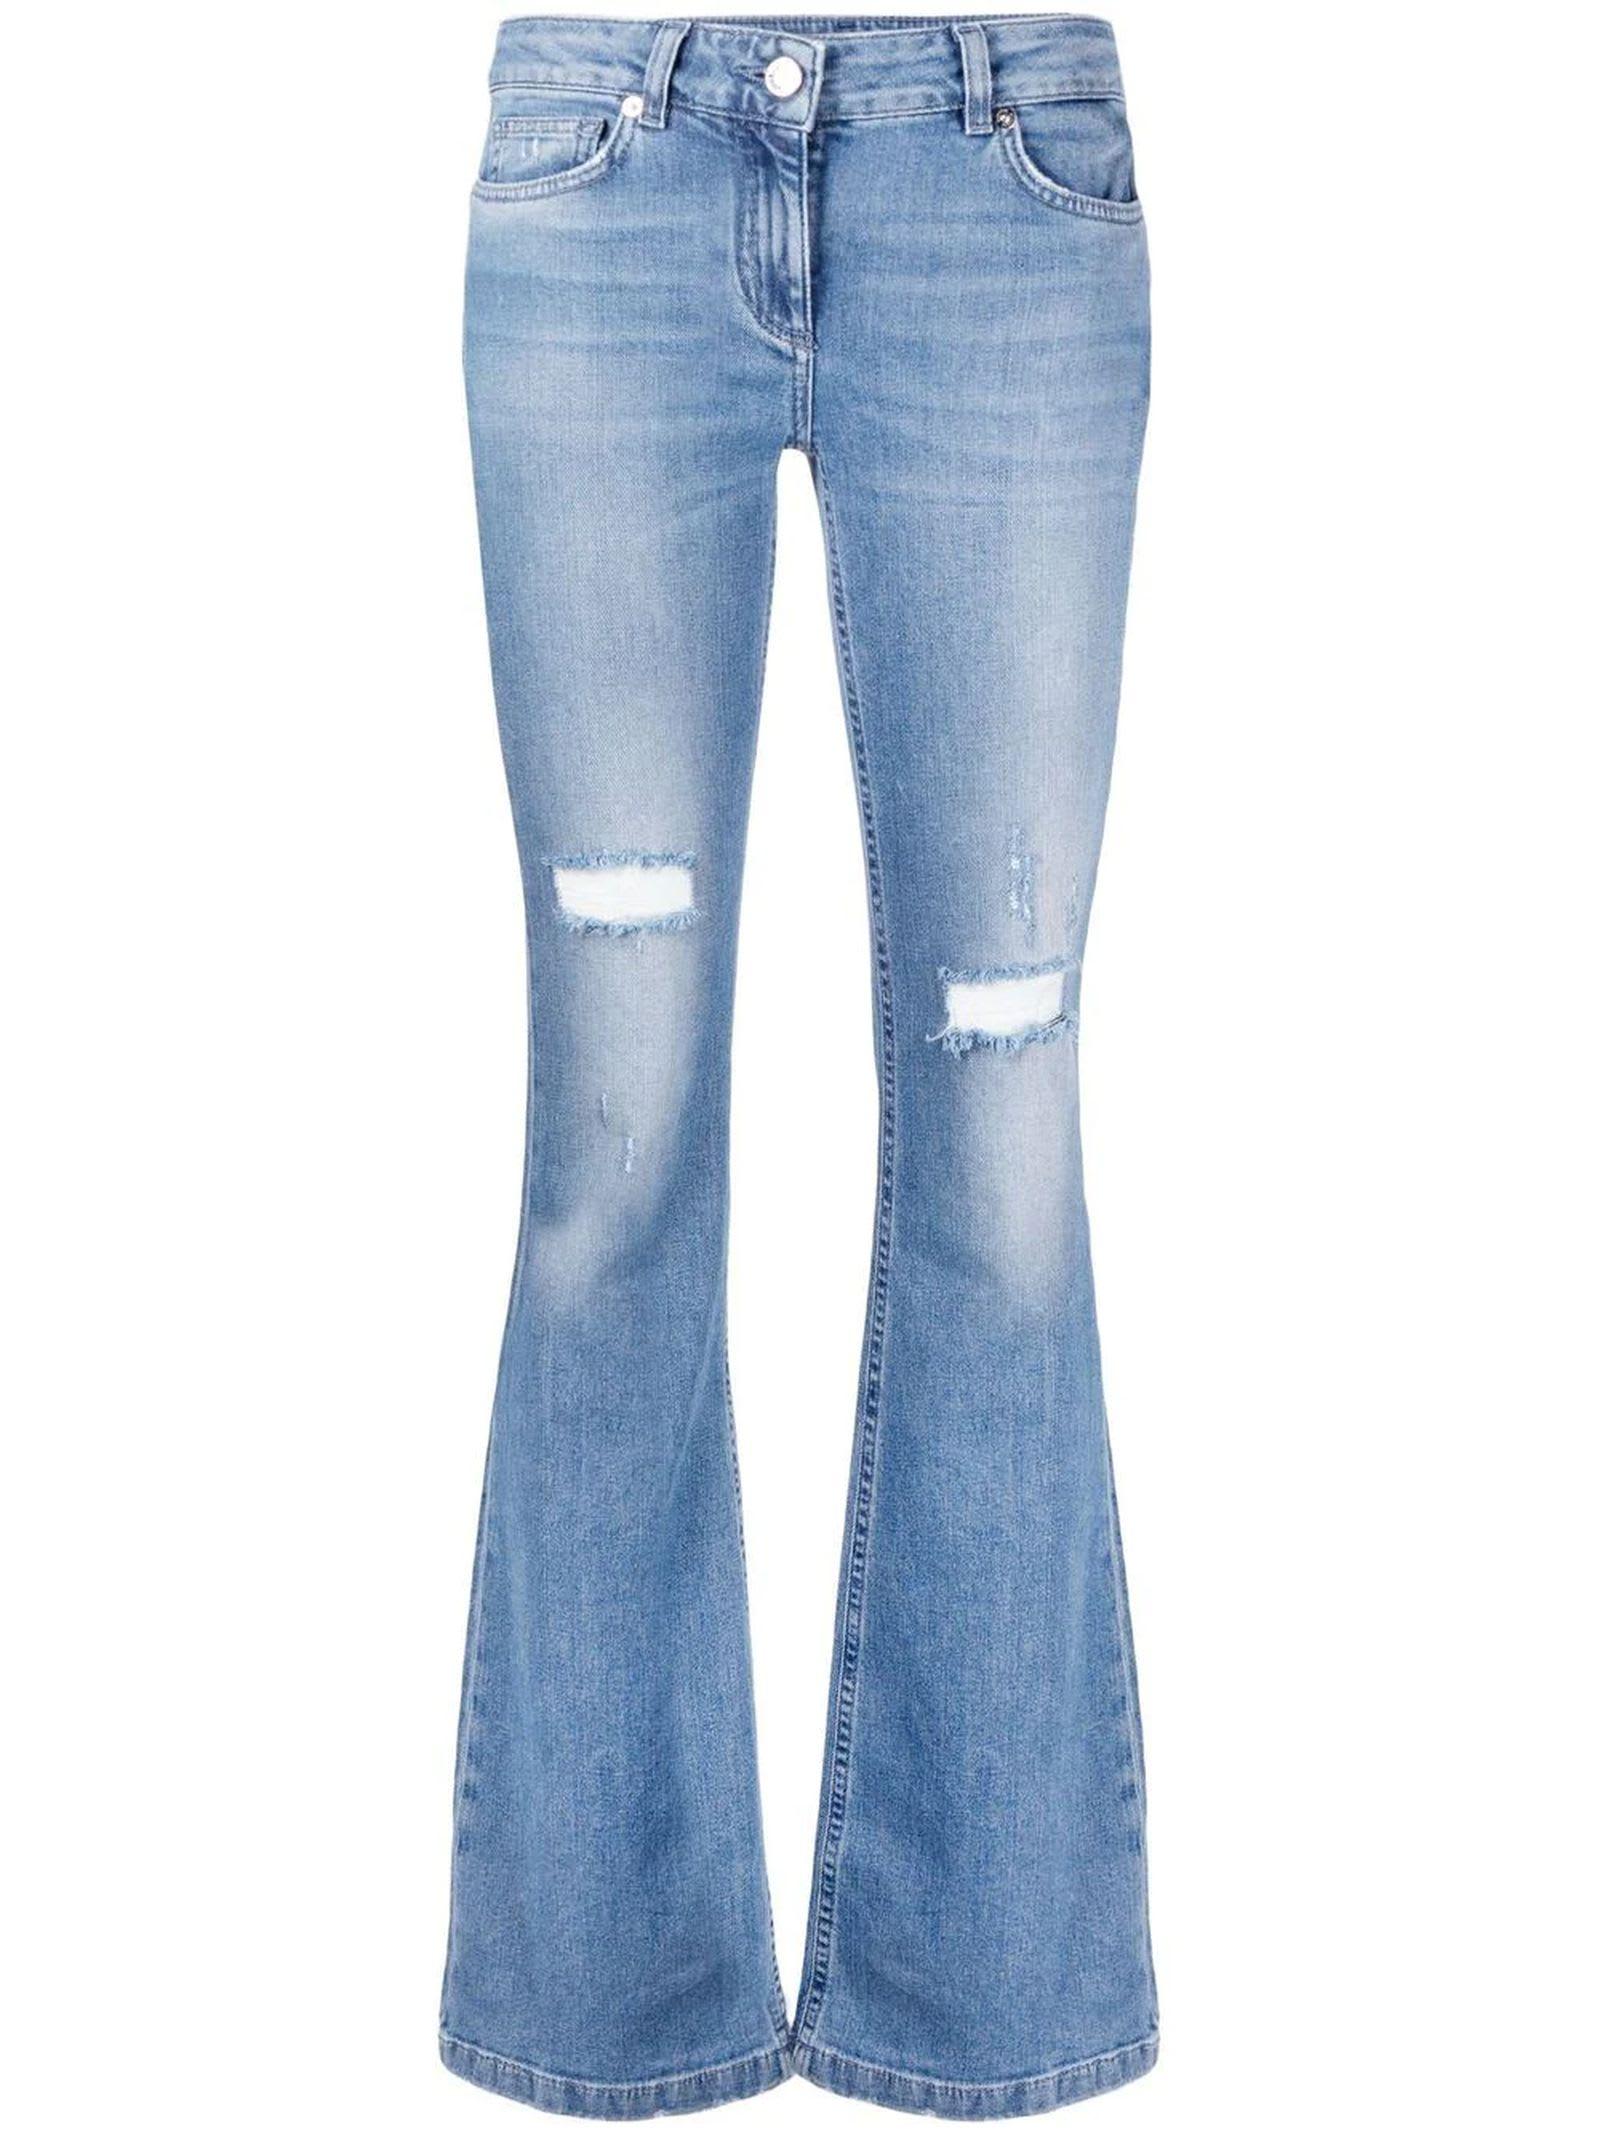 Blumarine Blue Stretch Cotton Jeans